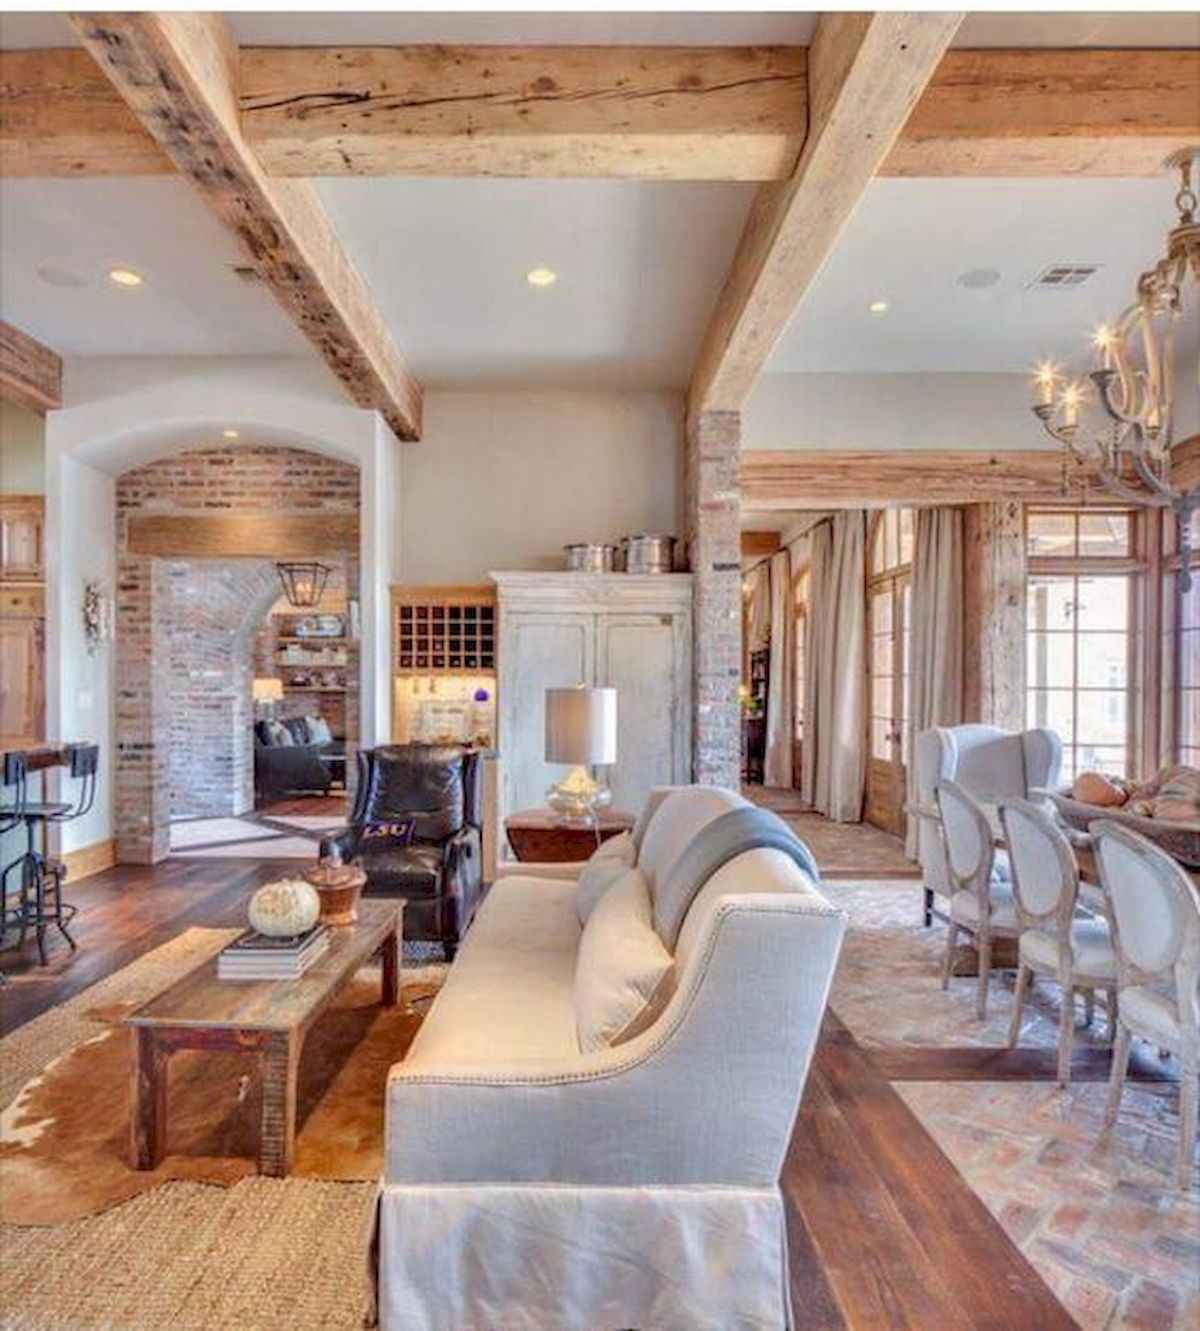 80 Awesome Modern Farmhouse Staircase Decor Ideas: 70 Elegant Modern Farmhouse Living Room Decor Ideas And